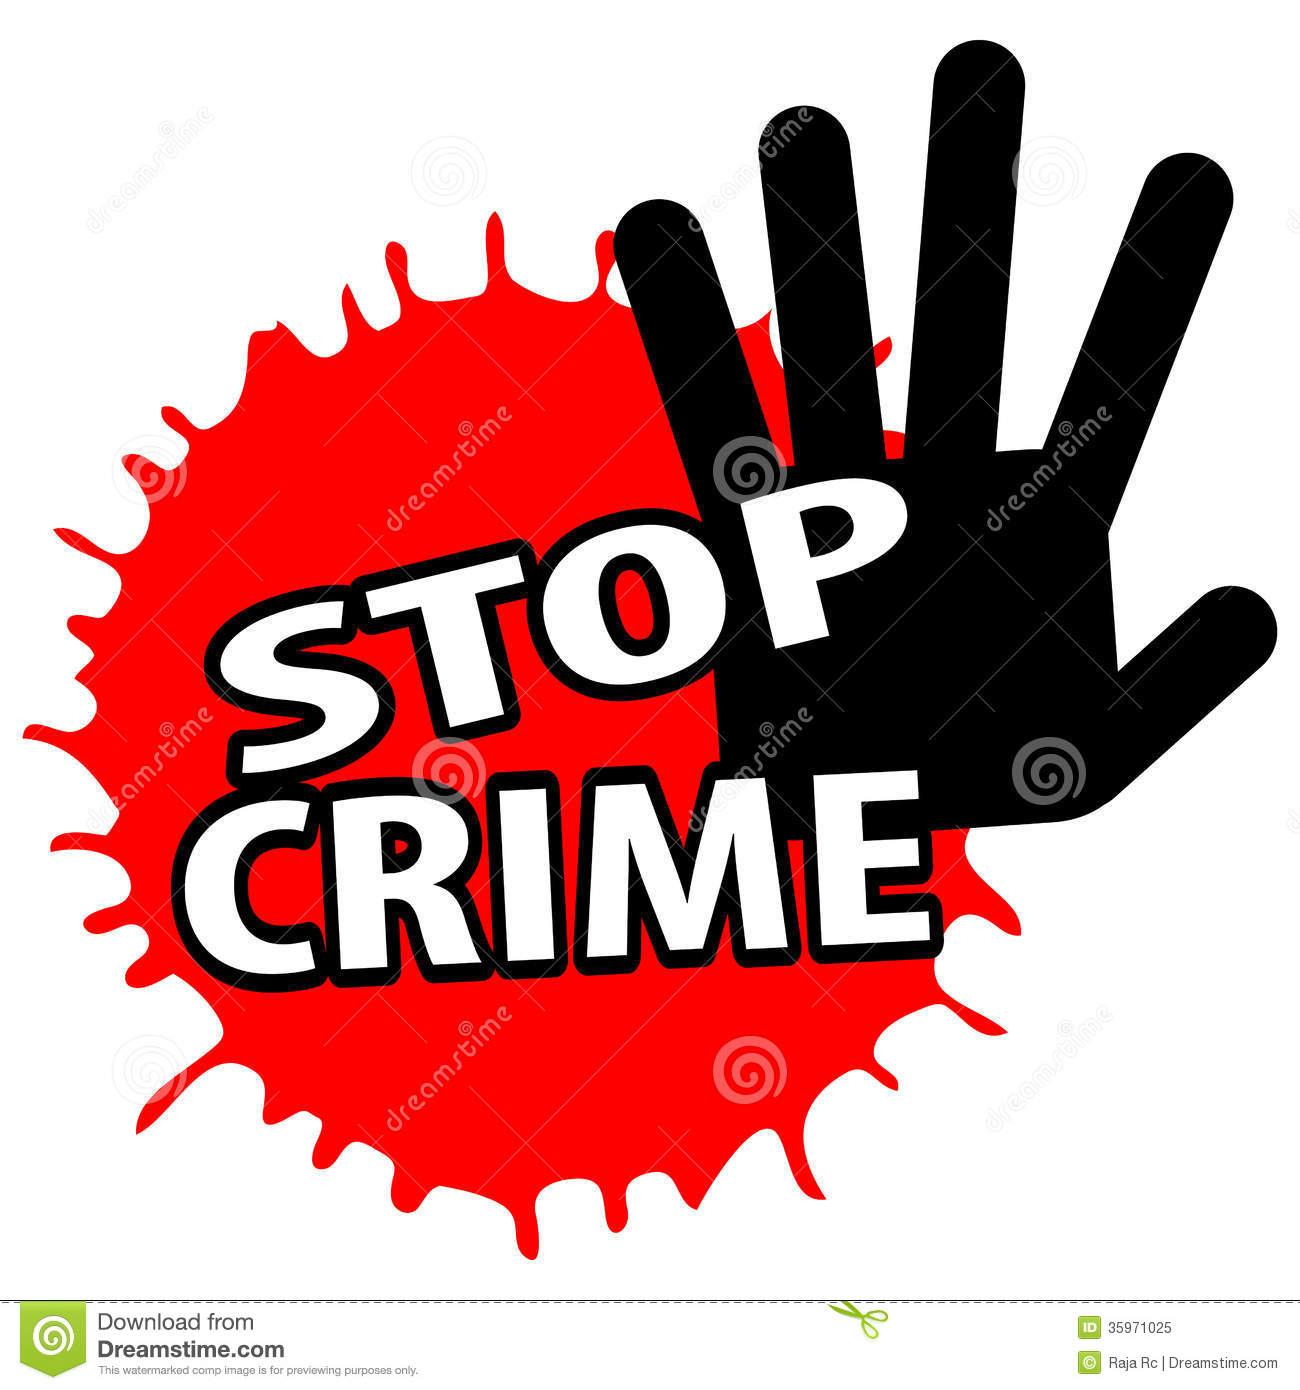 Free clipart crime picture free Crime Clip Art Free | Clipart Panda - Free Clipart Images picture free